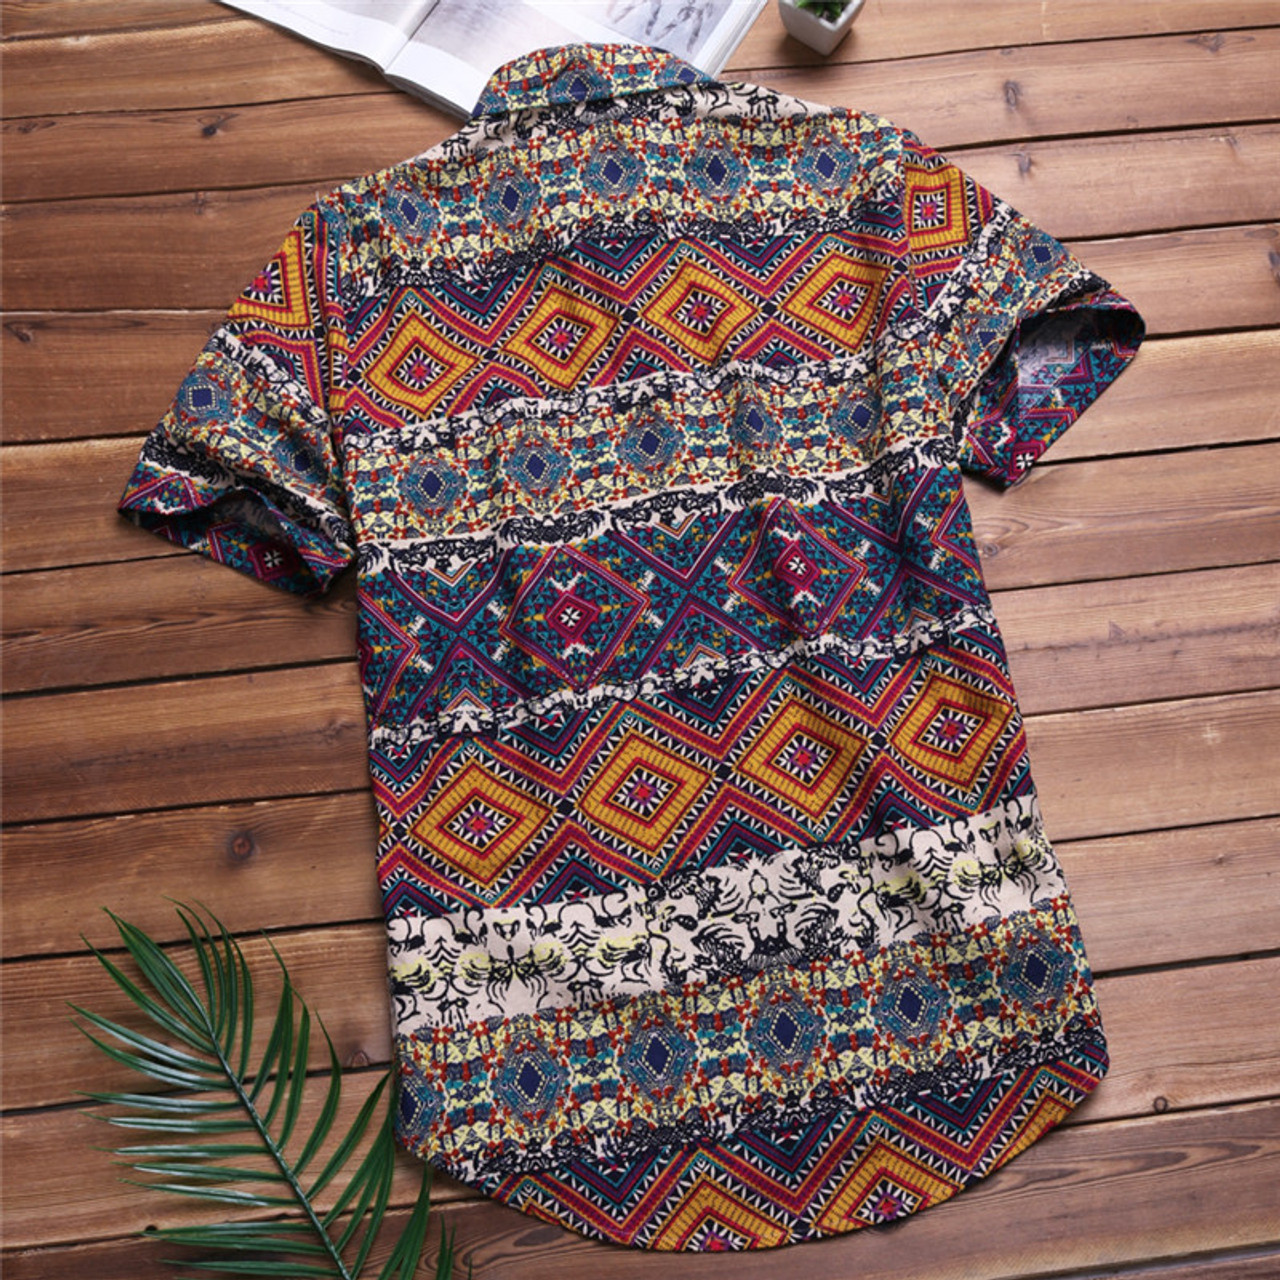 f750feb75364 ... Mens Beach Hawaiian Shirt Tropical Summer Short Sleeve Shirt Men Brand  Clothing Casual Loose Cotton Button ...